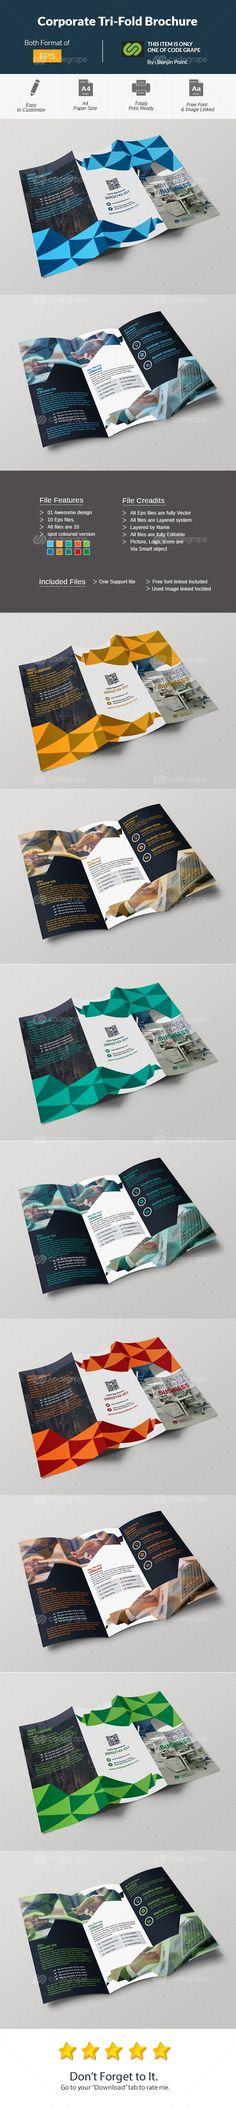 Corporate Tri-Fold Brochure on @codegrape. More Info: https://www.codegrape.com/item/corporate-tri-fold-brochure/11429